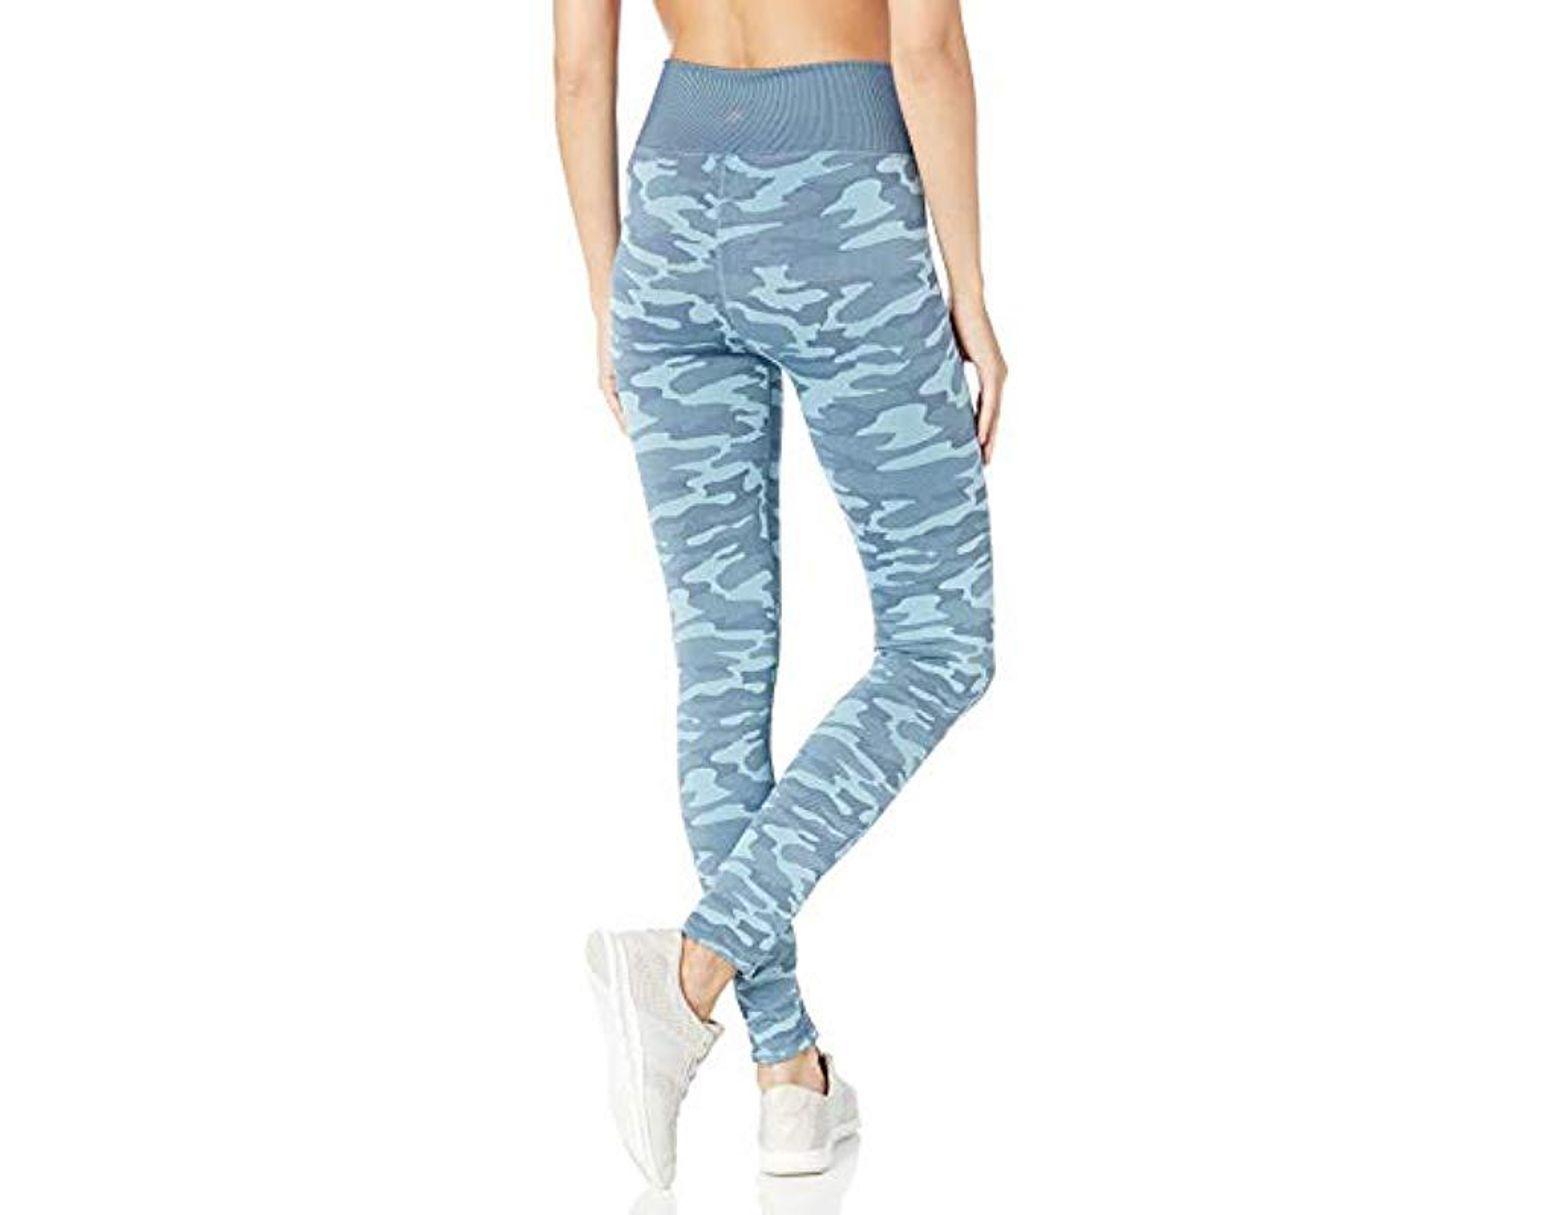 Splendid Womens Studio Activewear Workout Athletic Seamless Legging Bottom